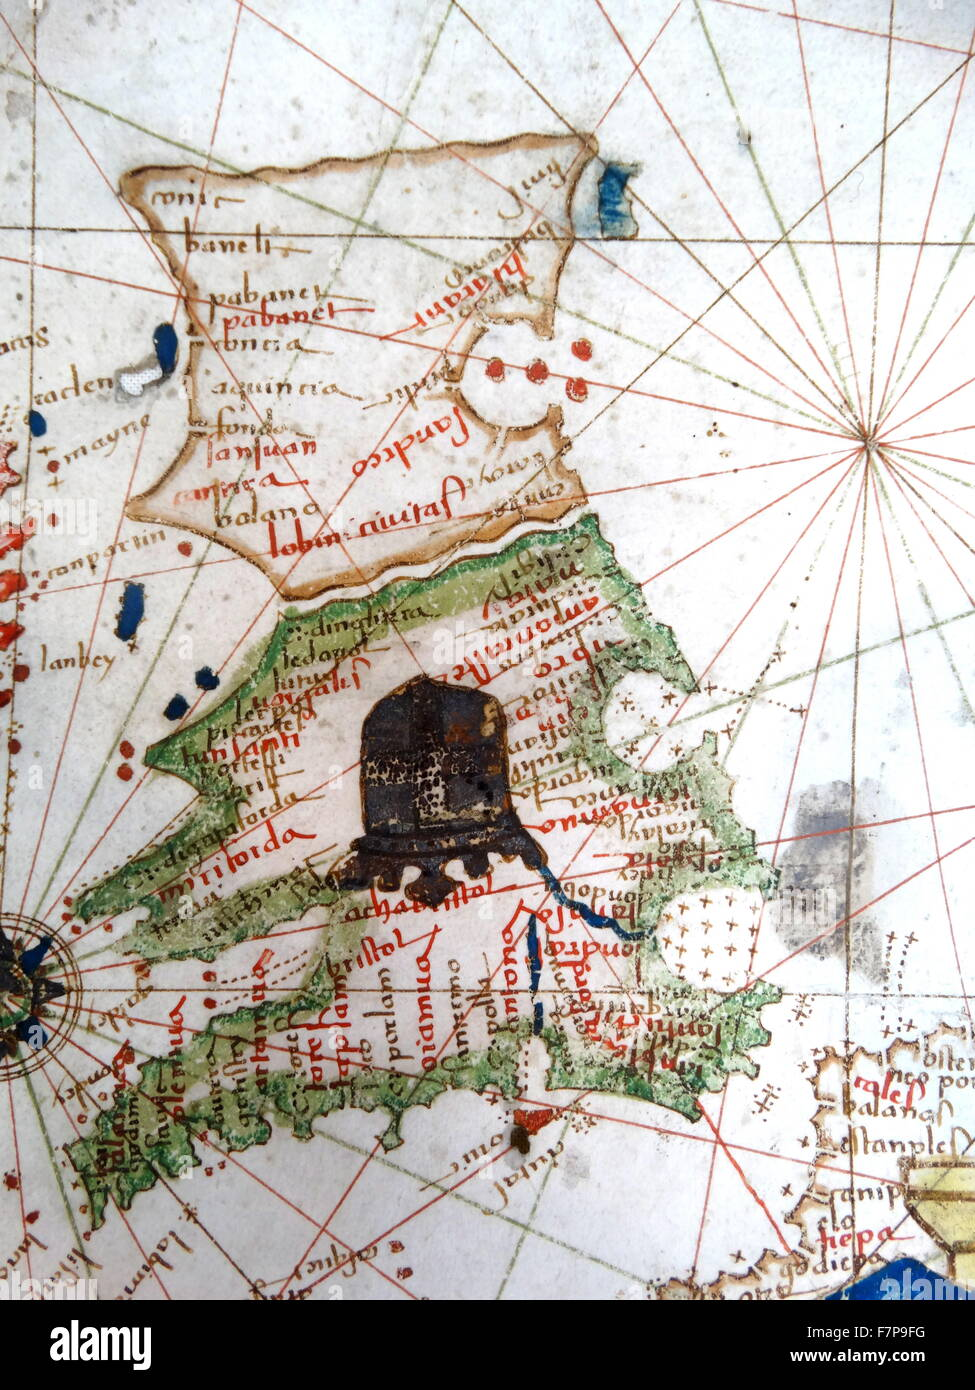 Renaissance map of Europe, Jacopo Russo, 1528, detail ... on corea del sur map, iran map, serbia map, portugal map, chad map, taiwan map, marruecos map, bolivia map, bangladesh map, burkina faso map, paraguay map, islandia map, españa map, trinidad y tobago map, sri lanka map, uganda map, ucrania map, el salvador map, granada map,